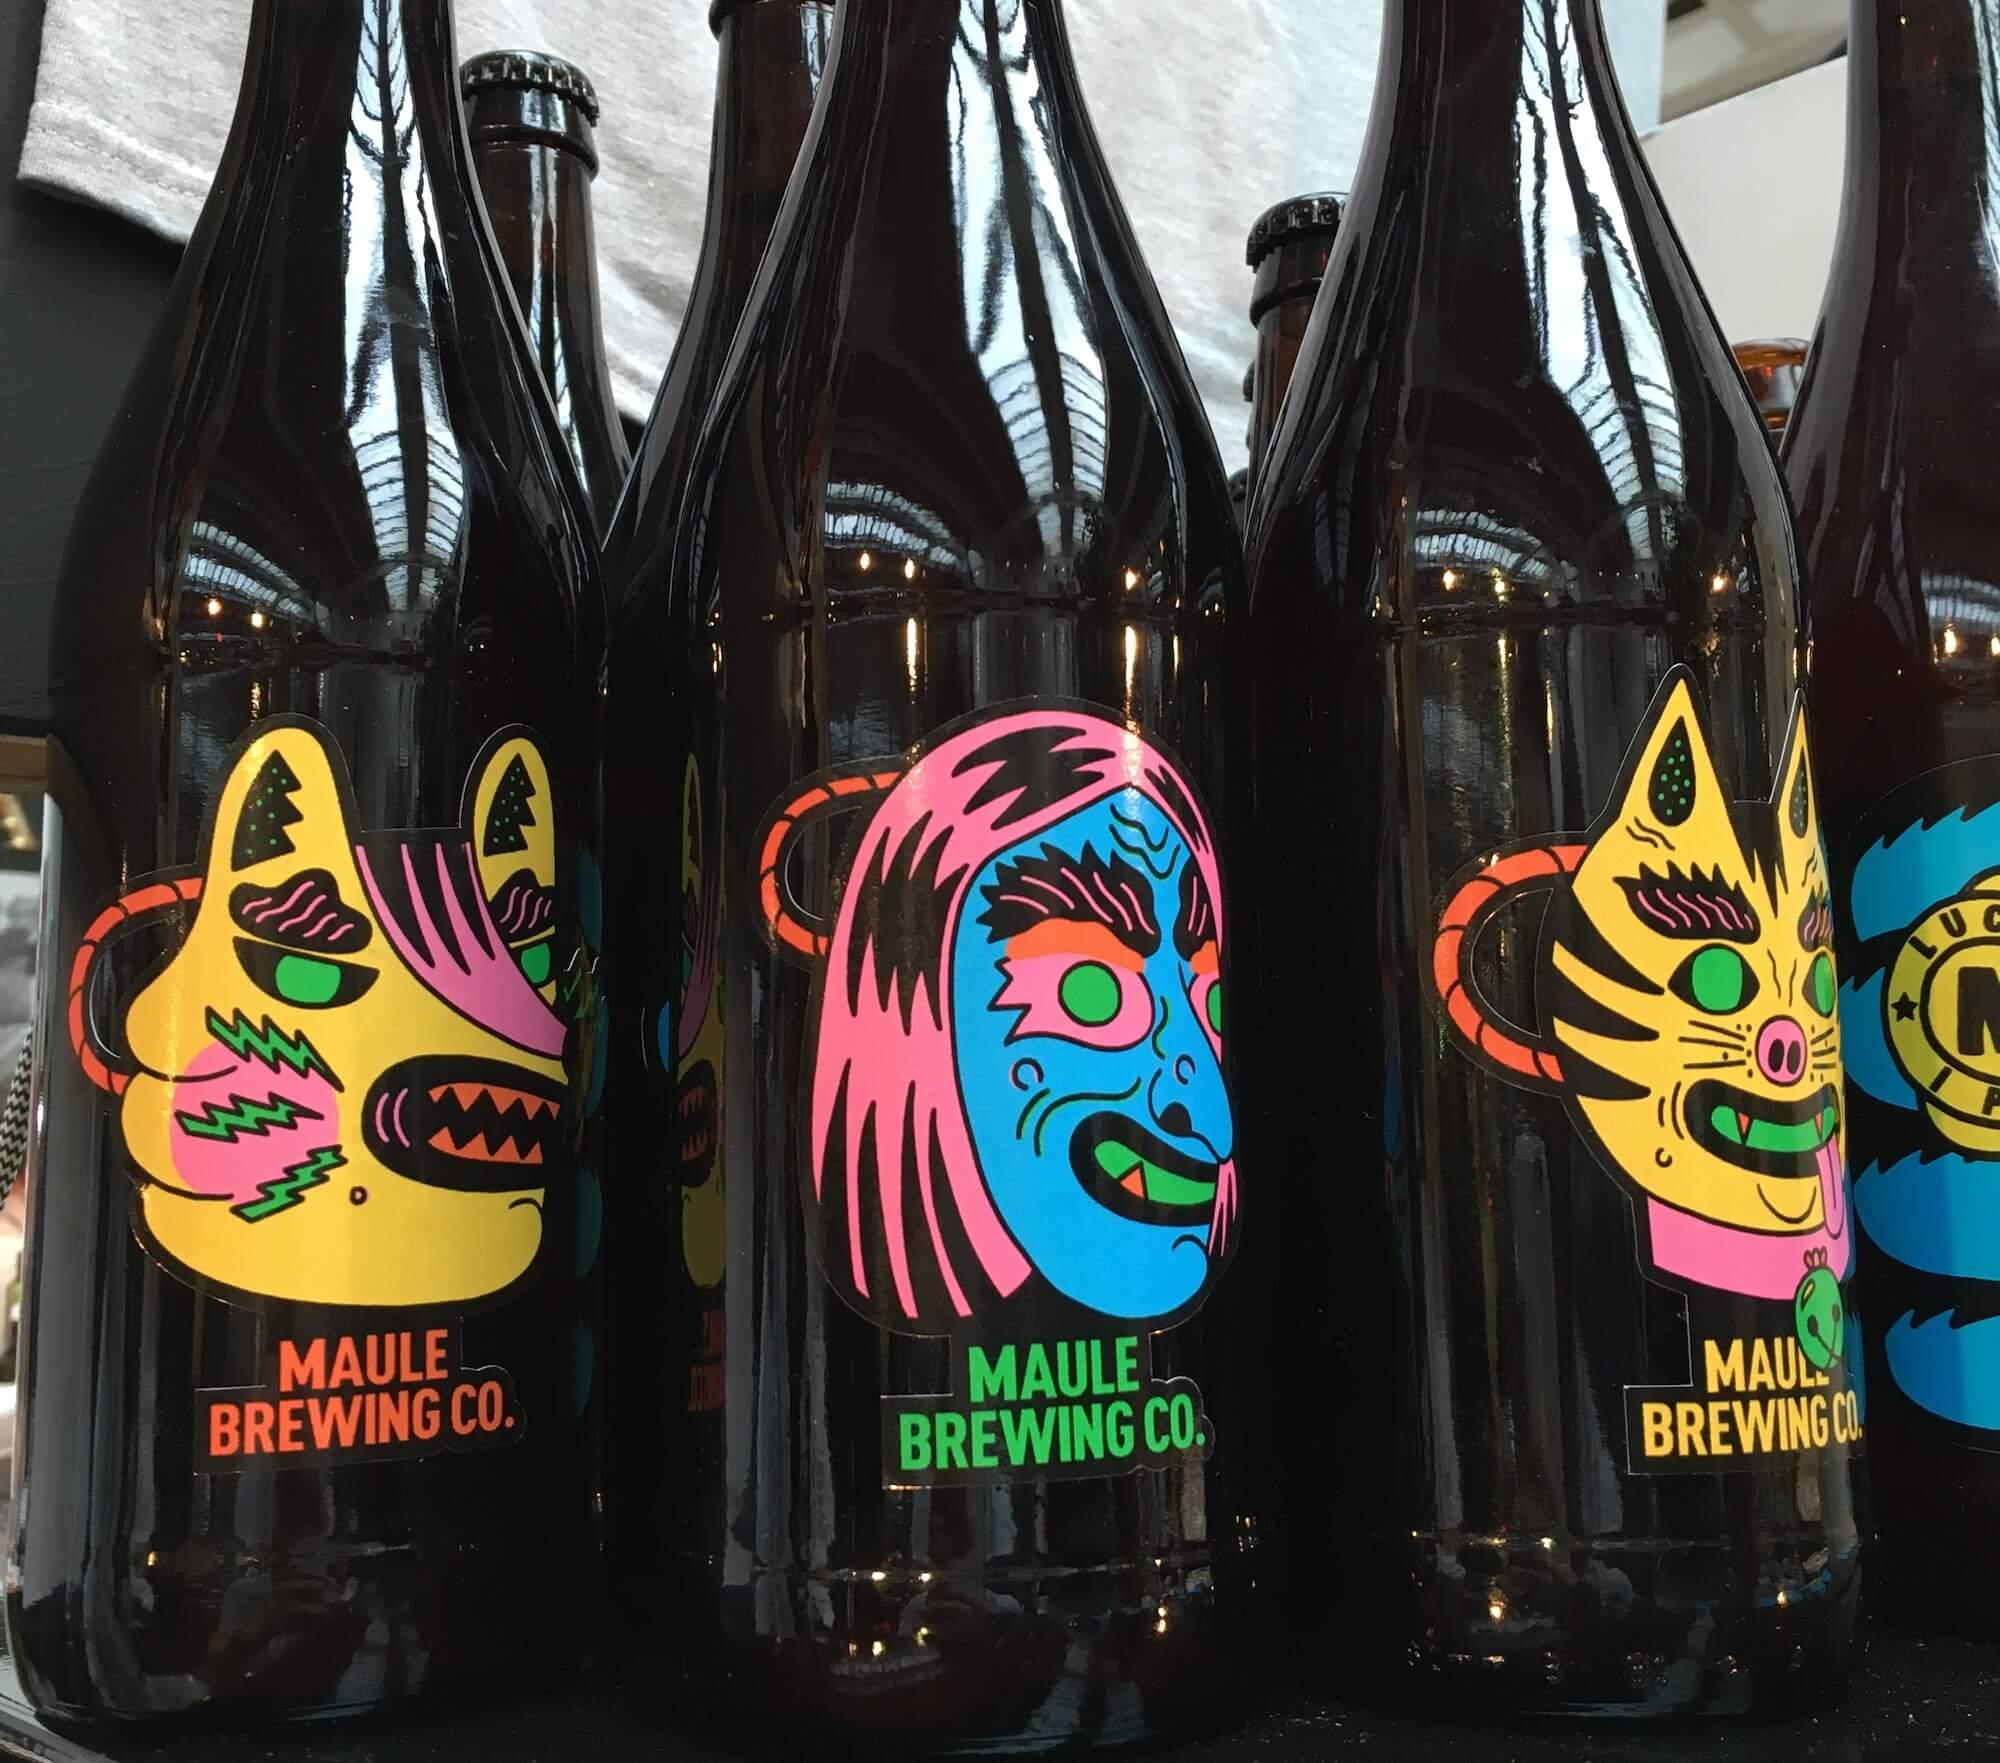 Maule Brewing